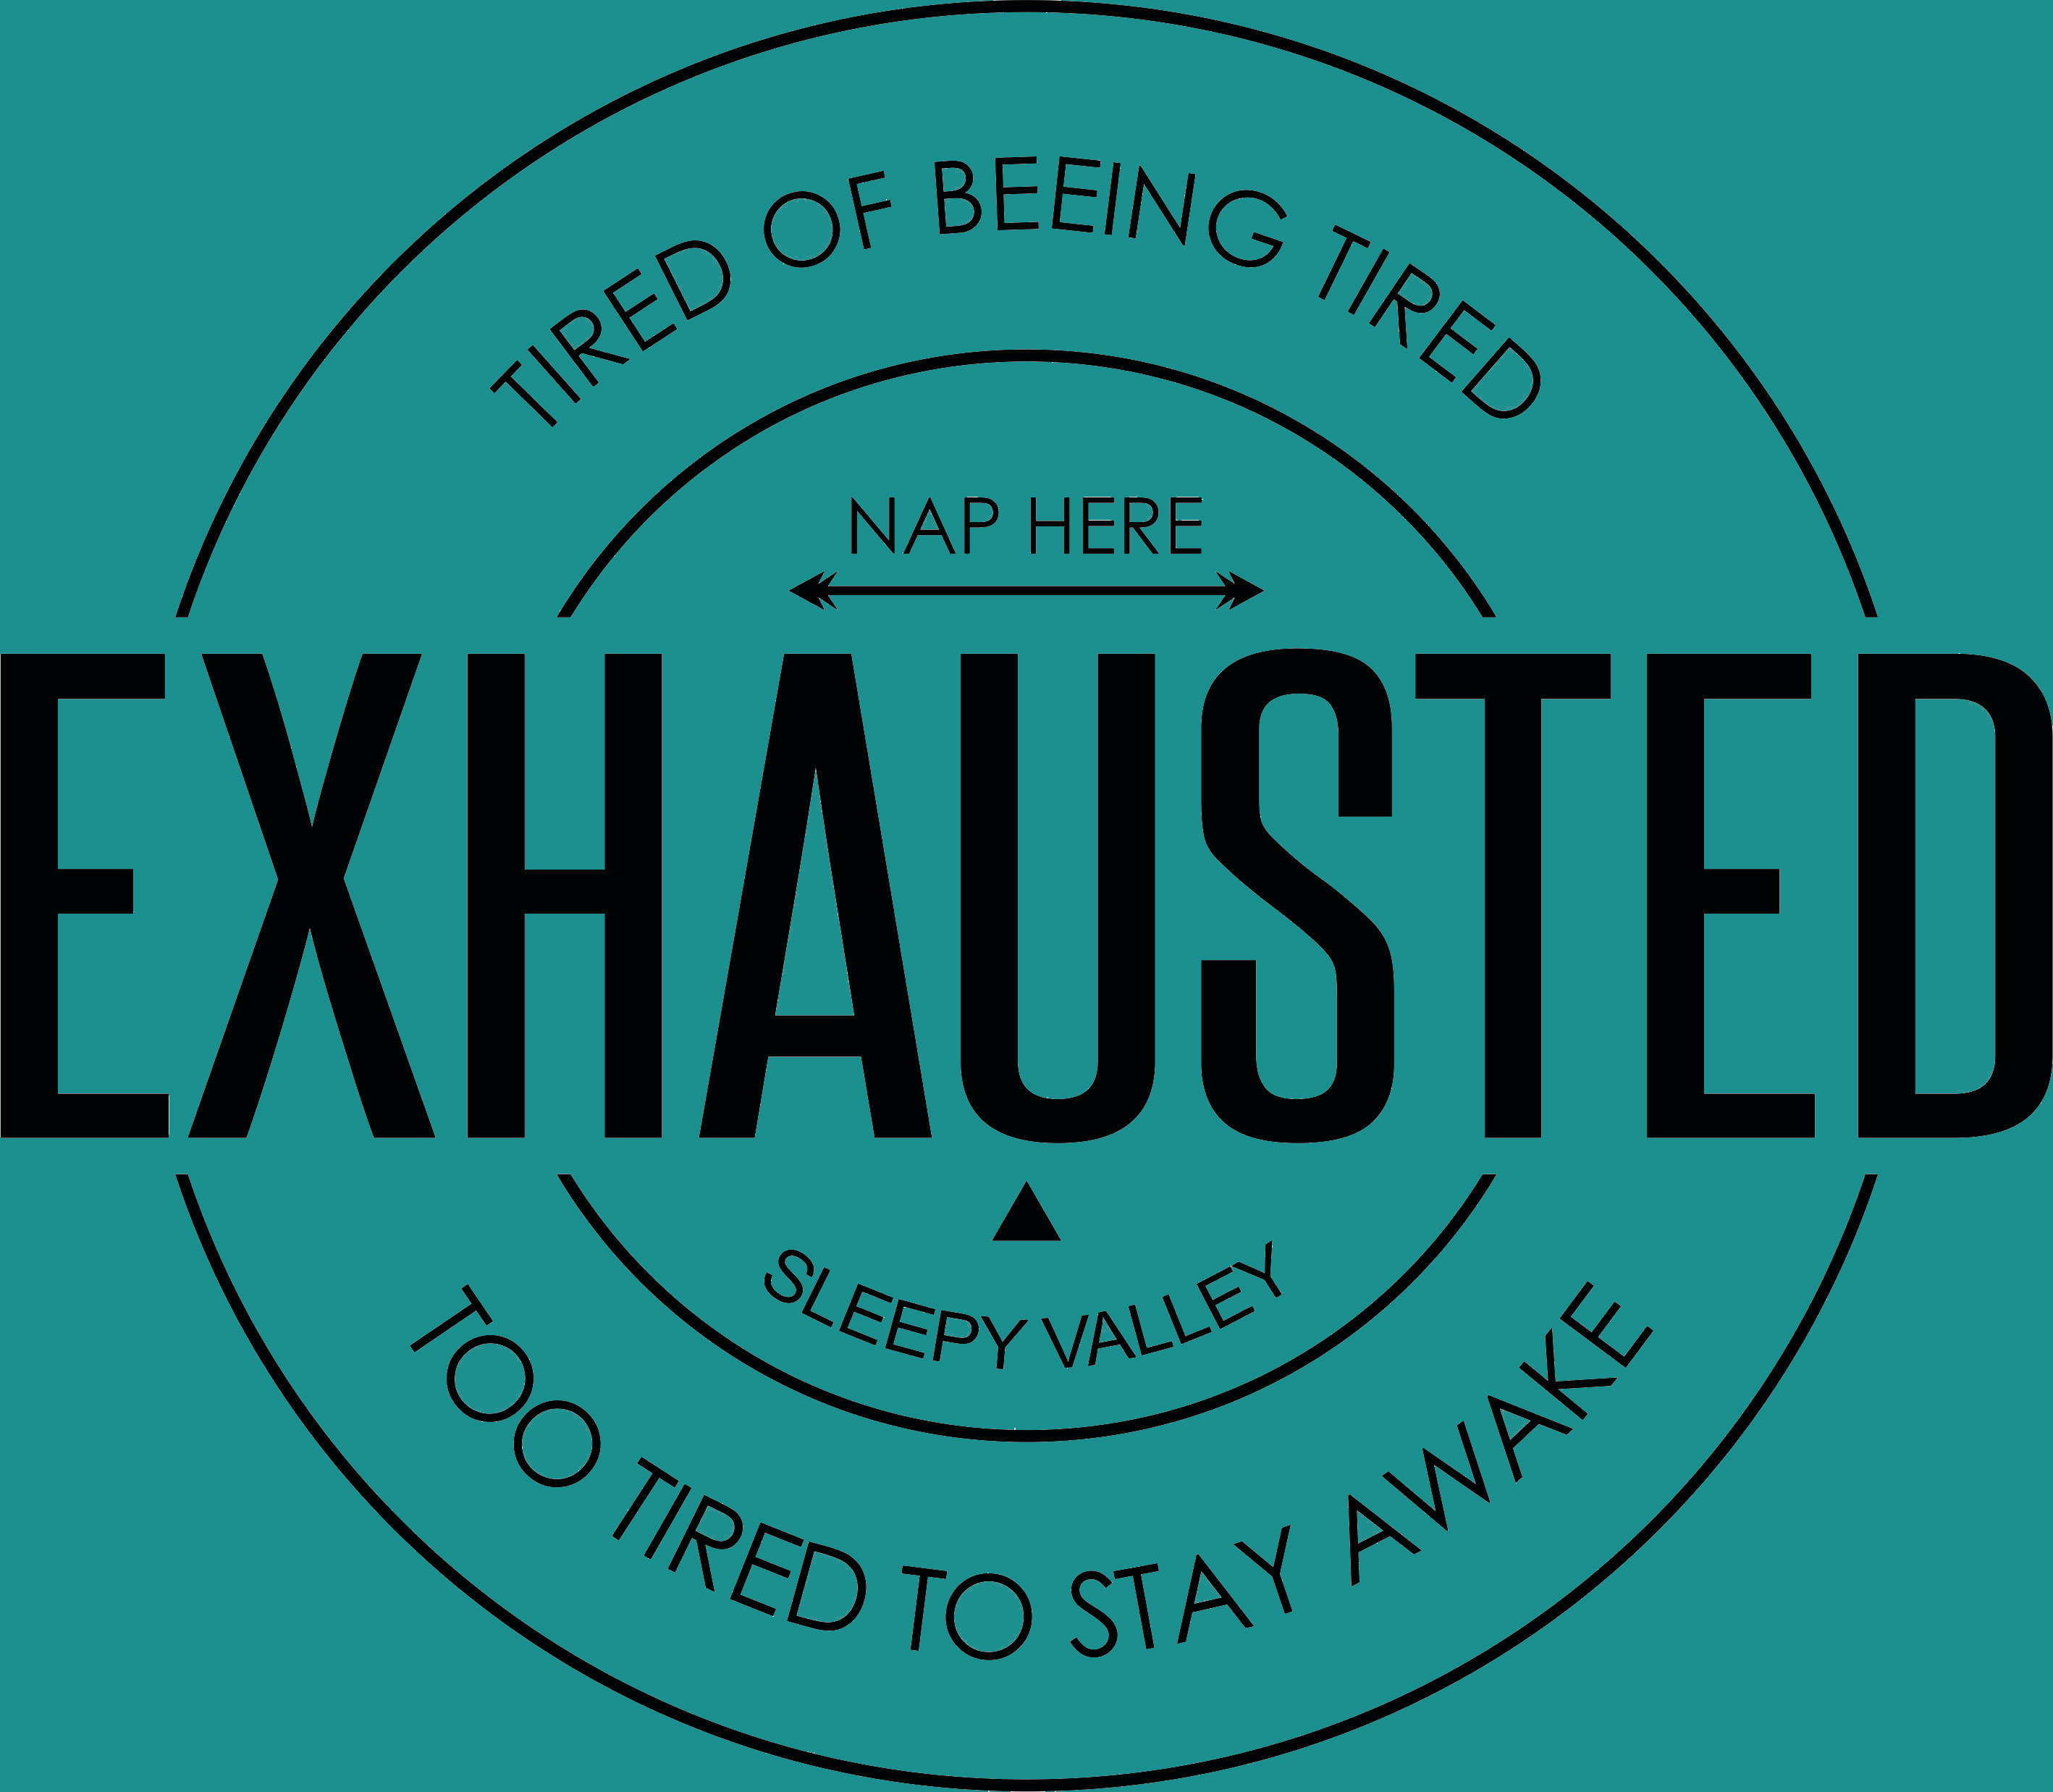 cama exhausted tiffany 3